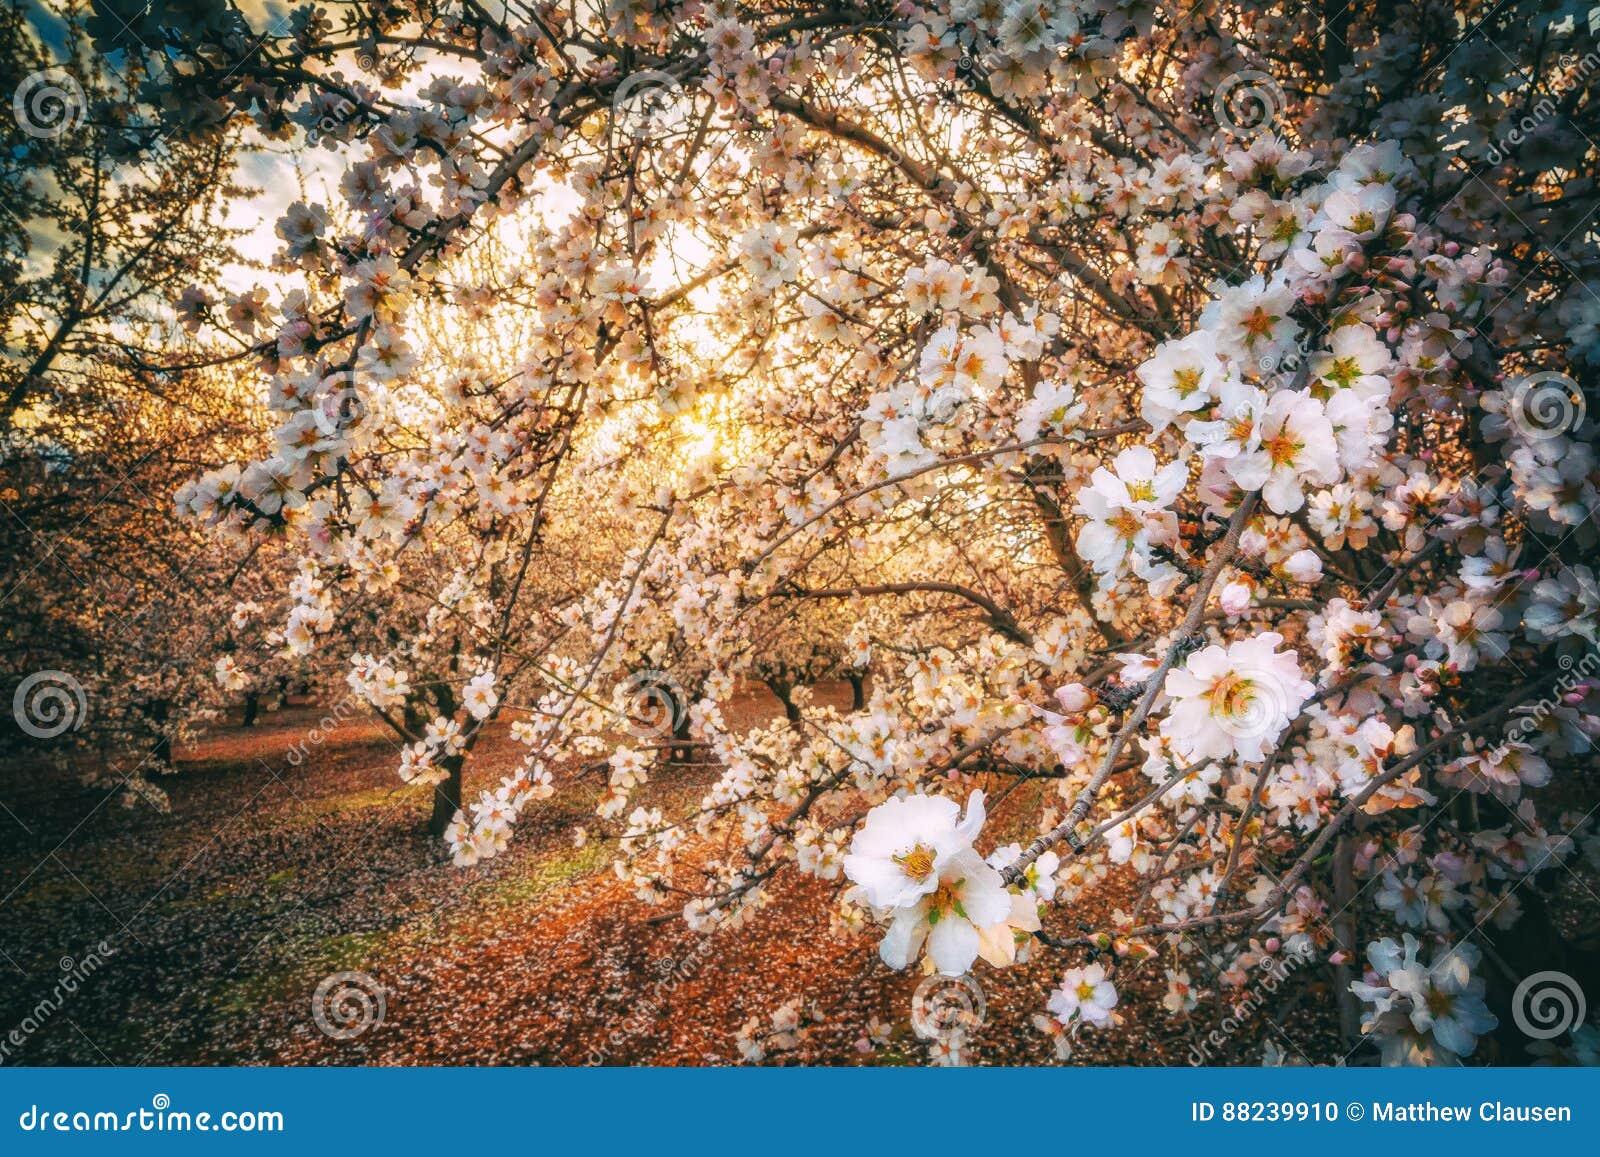 California Blossom Trail